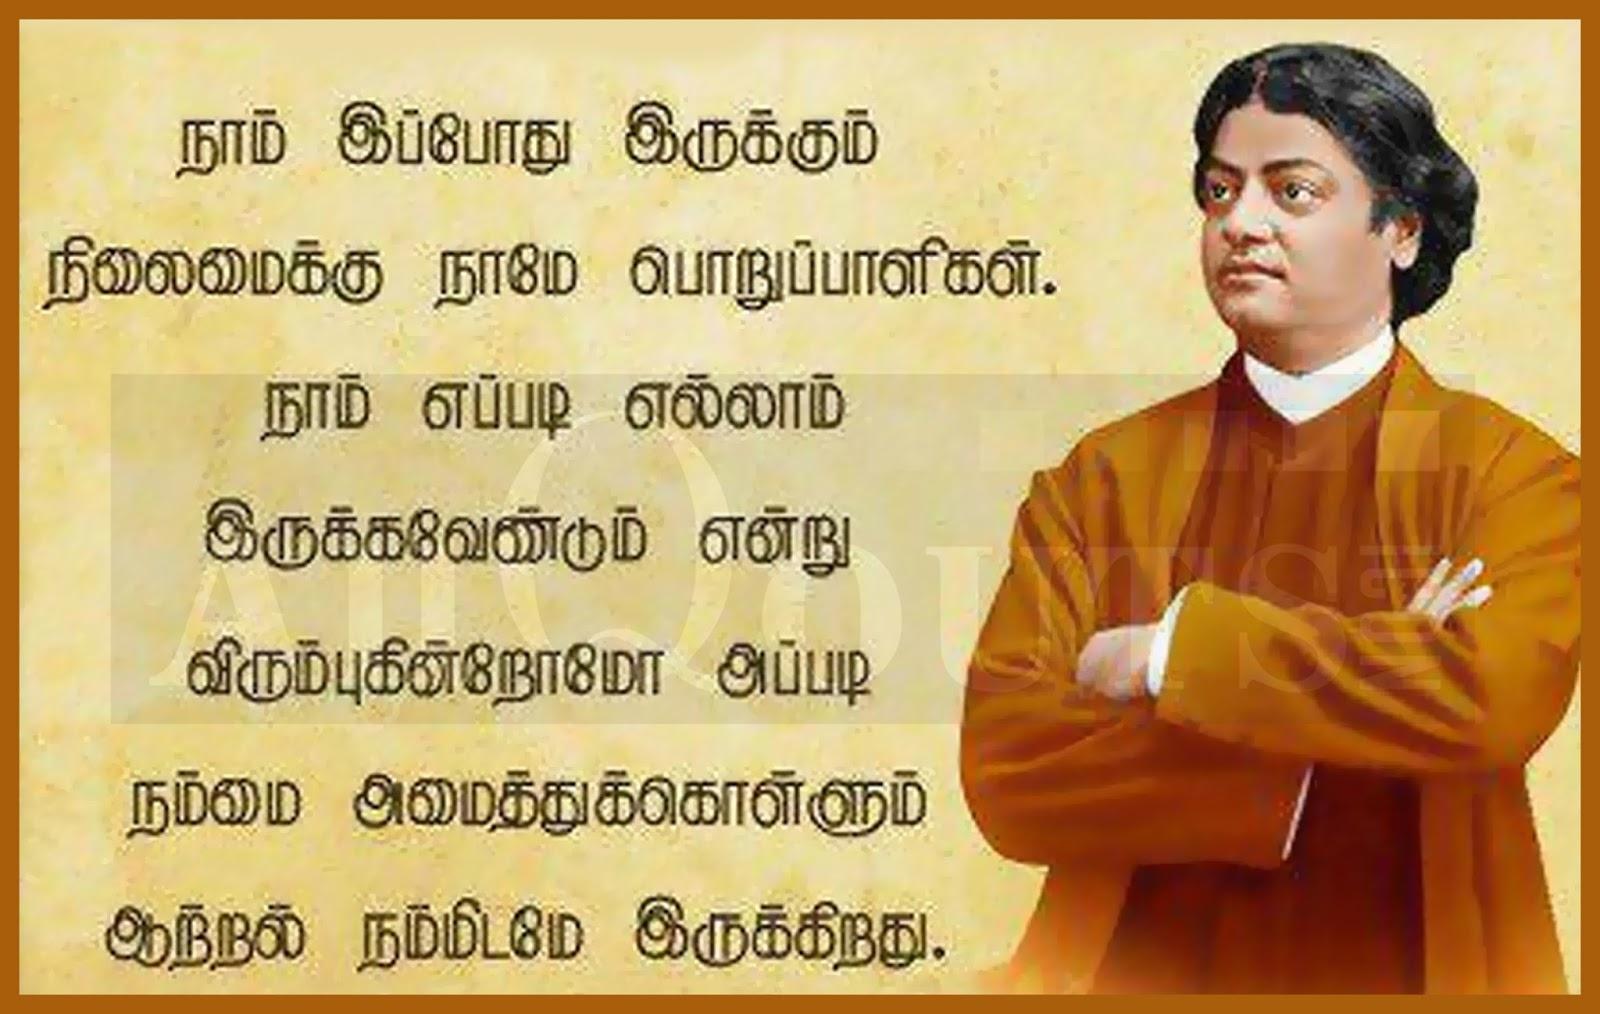 swami vivekananda tamil quotes - photo #24